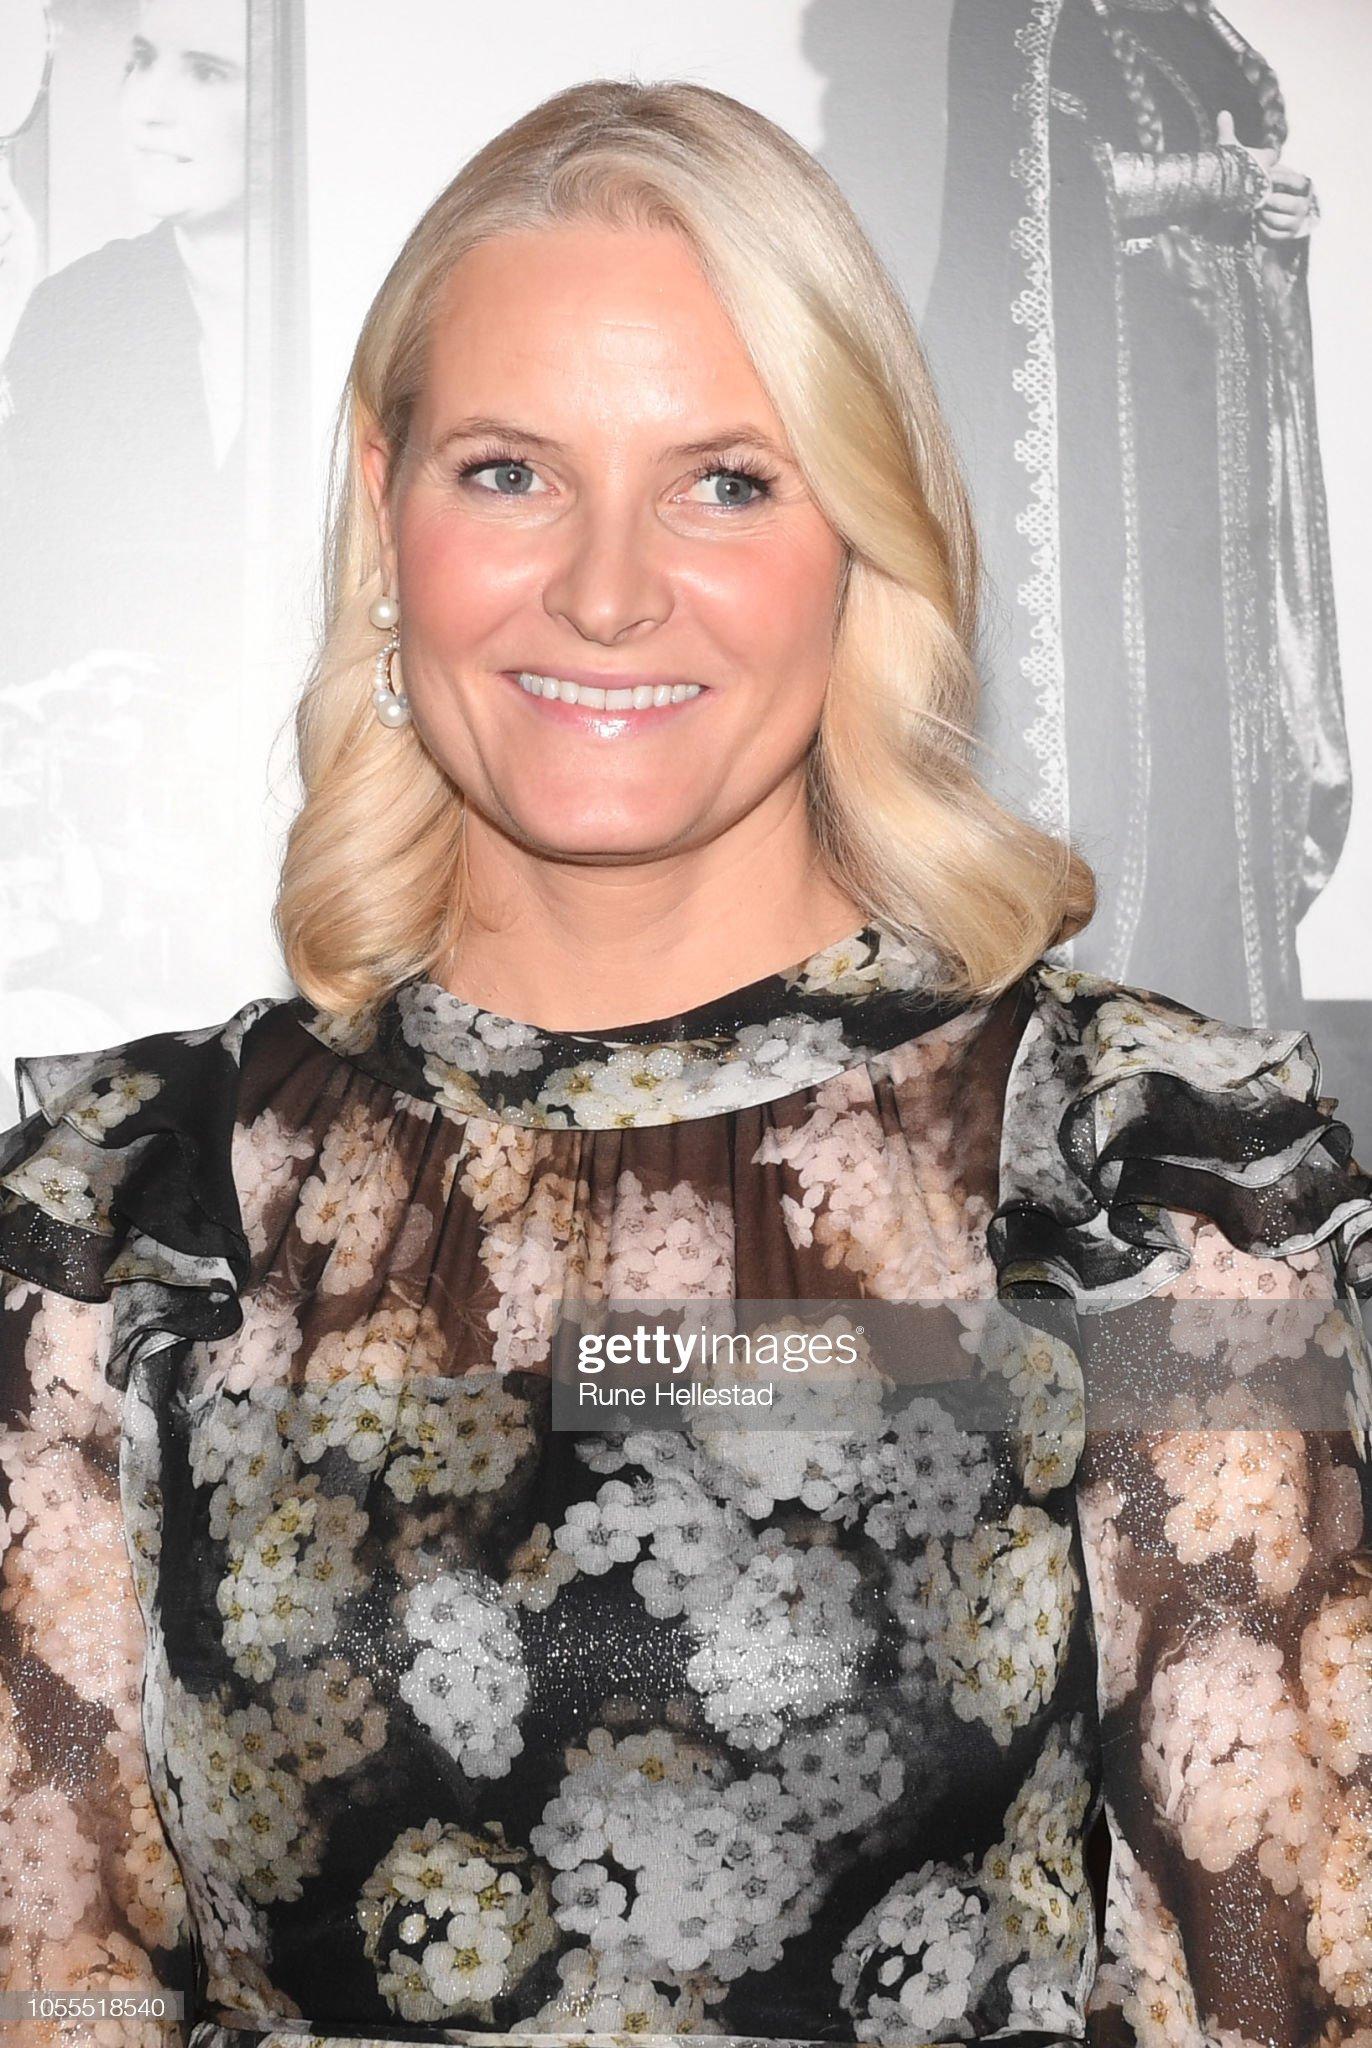 Crown Princess Mette Marit Presents The Nordic Council Literature Prize 2018 : News Photo